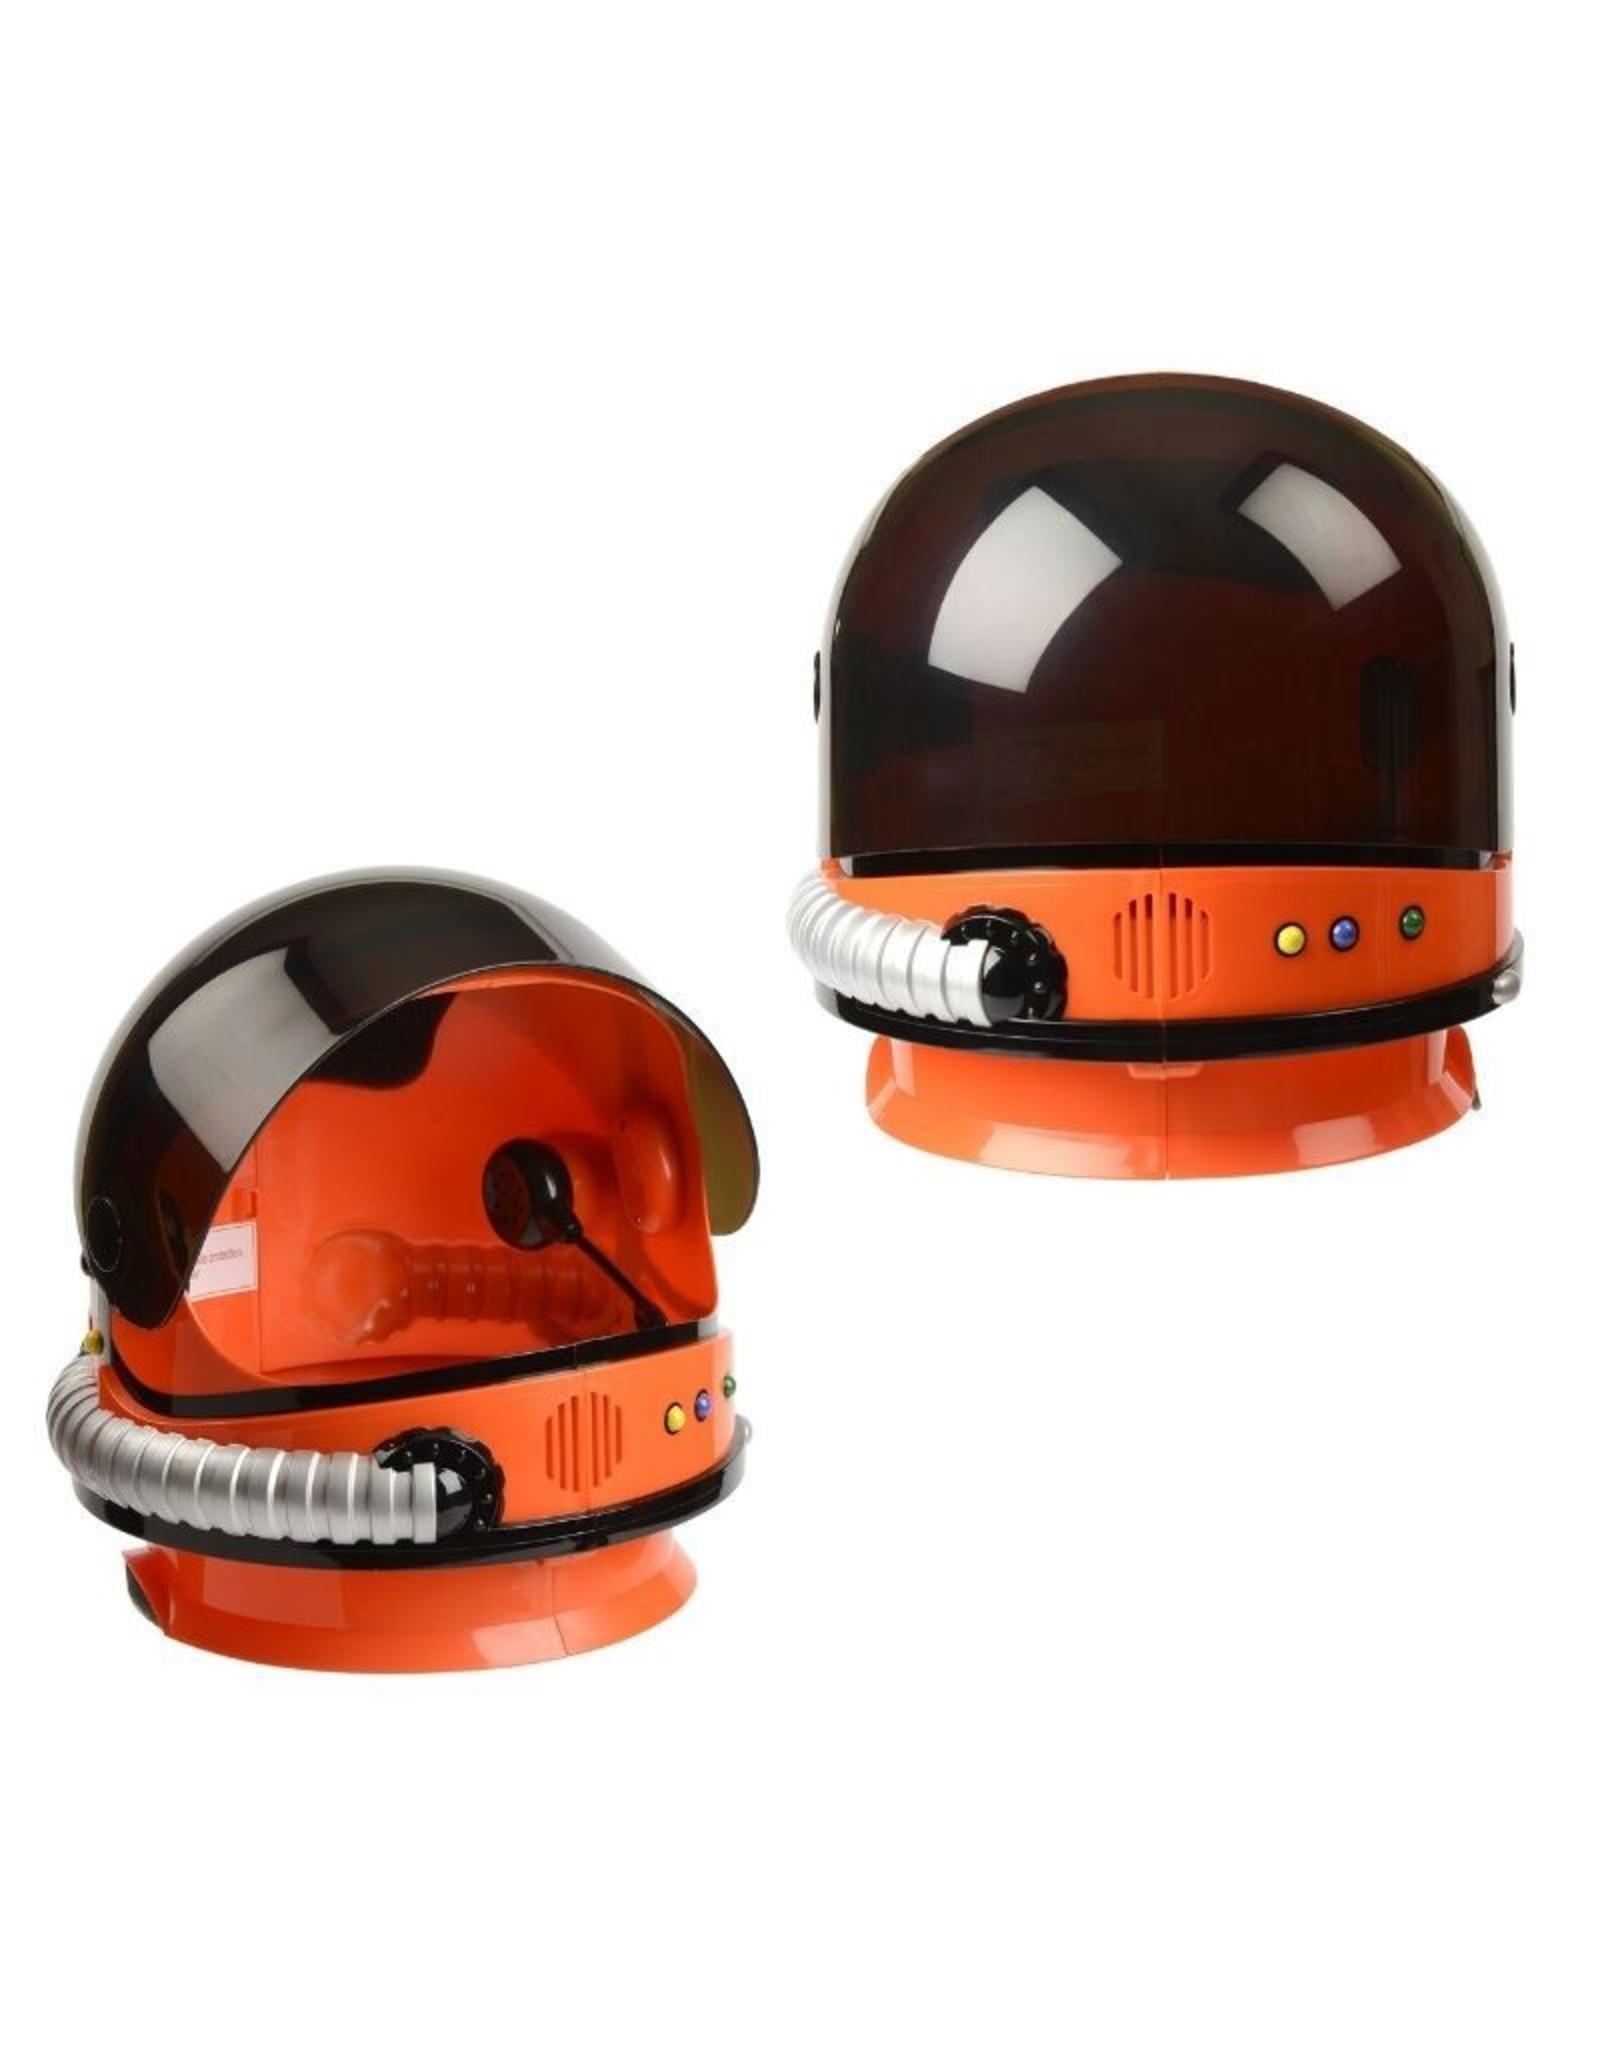 Aeromax Jr. Astronaut Helmet with Sound